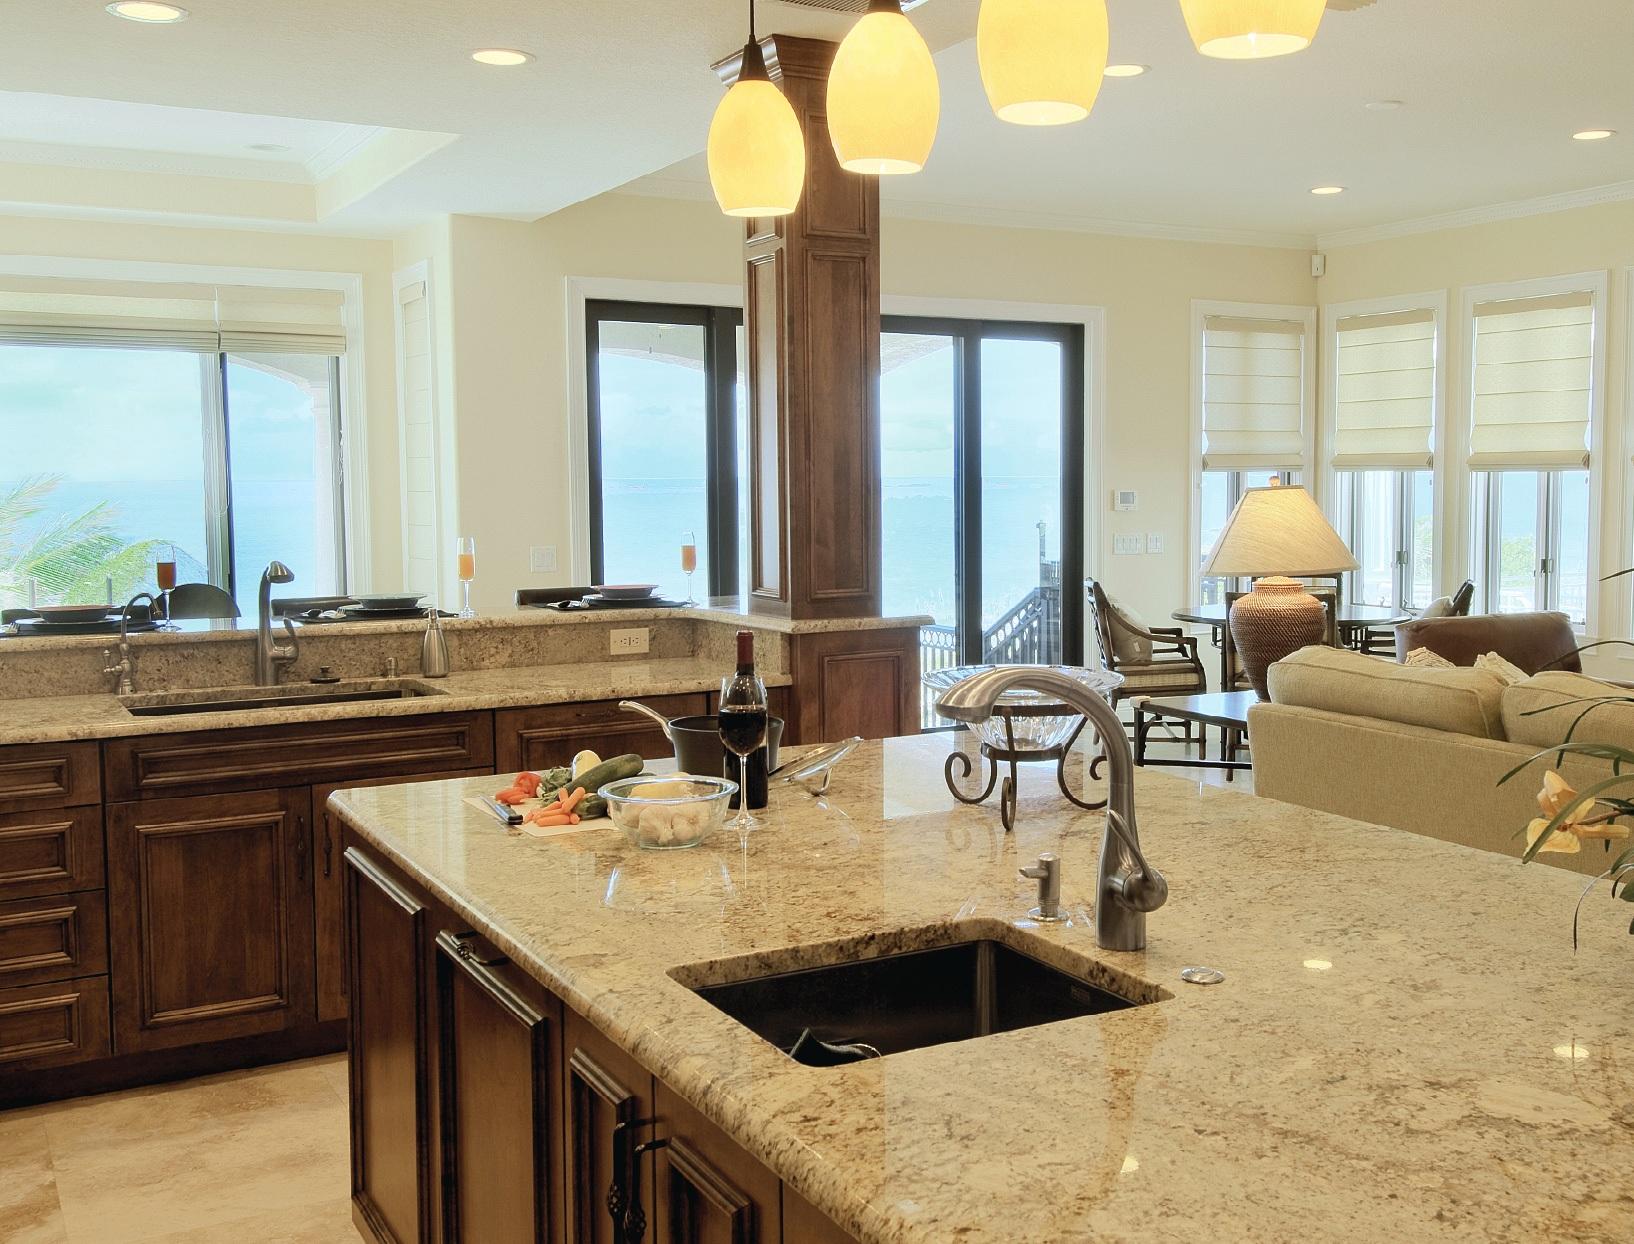 kitchen dining island photo - 2